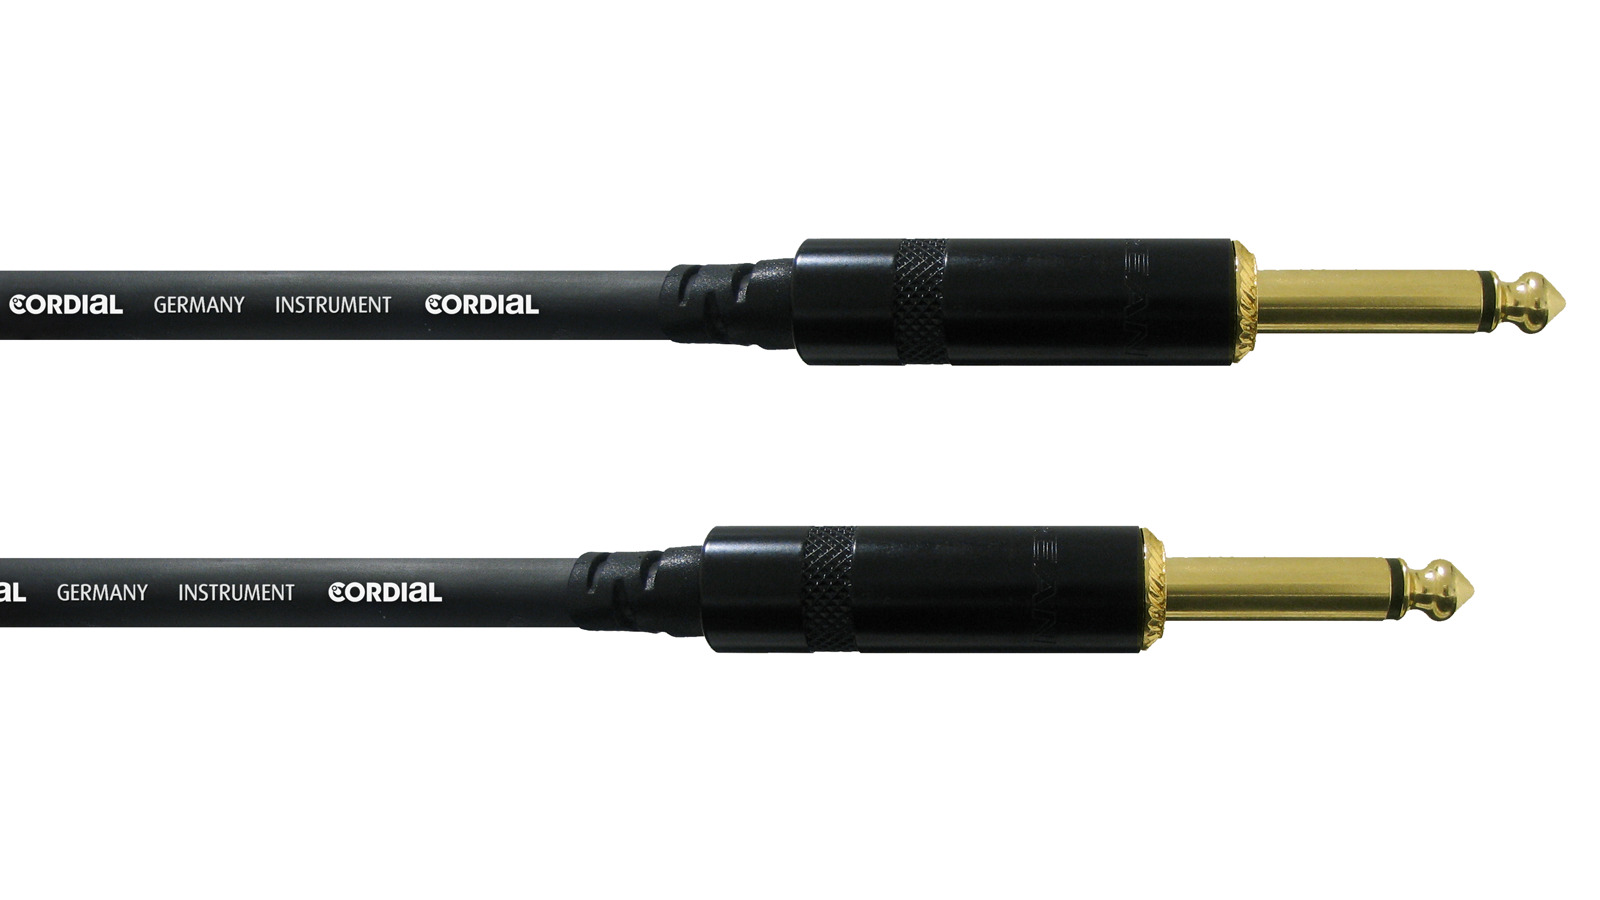 Cordial CCI 3 PP Instrumentenkabel 3 m